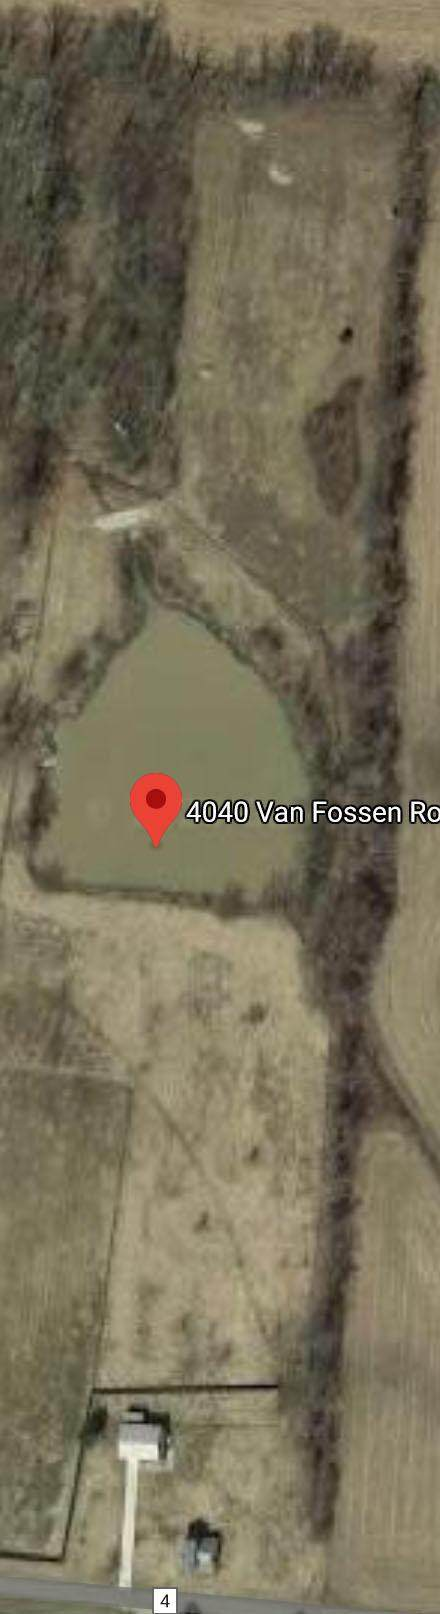 4040 Van Fossen Road, Johnstown, OH 43031 (MLS #220029022) :: The Clark Group @ ERA Real Solutions Realty